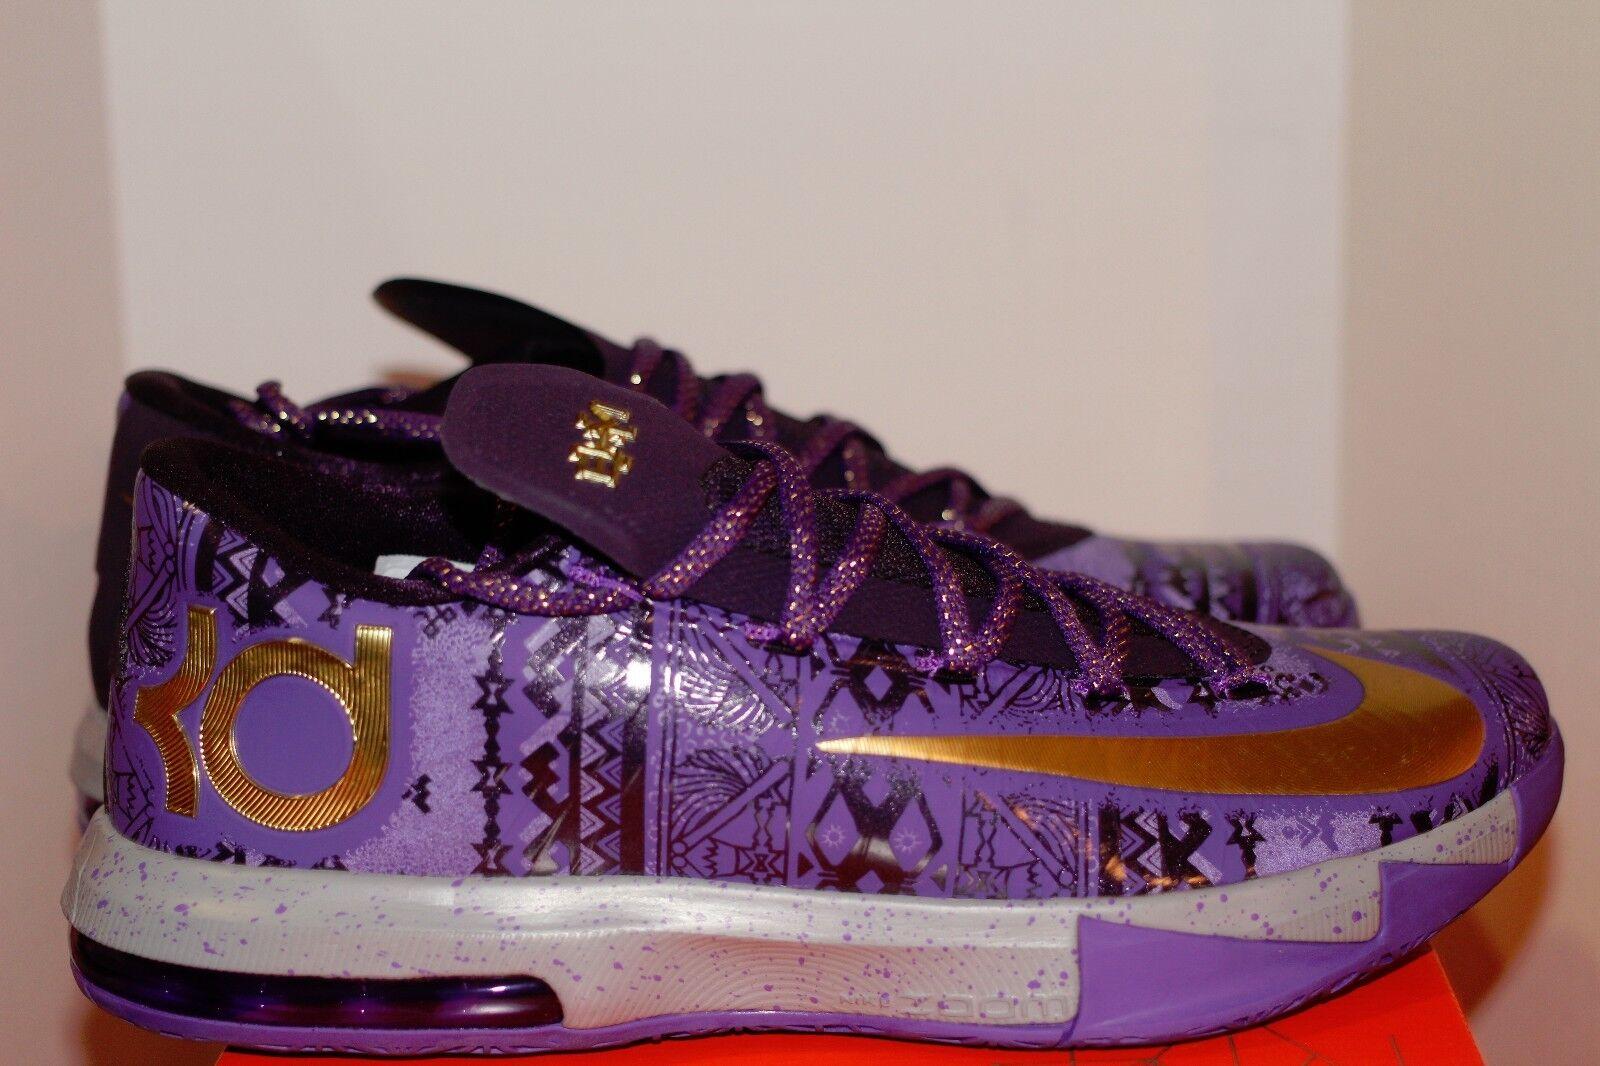 Nike KD BHM vi DS SZ 10 oro purpura purpura purpura Ravens de Baltimore Washington Huskies Lakers marca de descuento 62e333